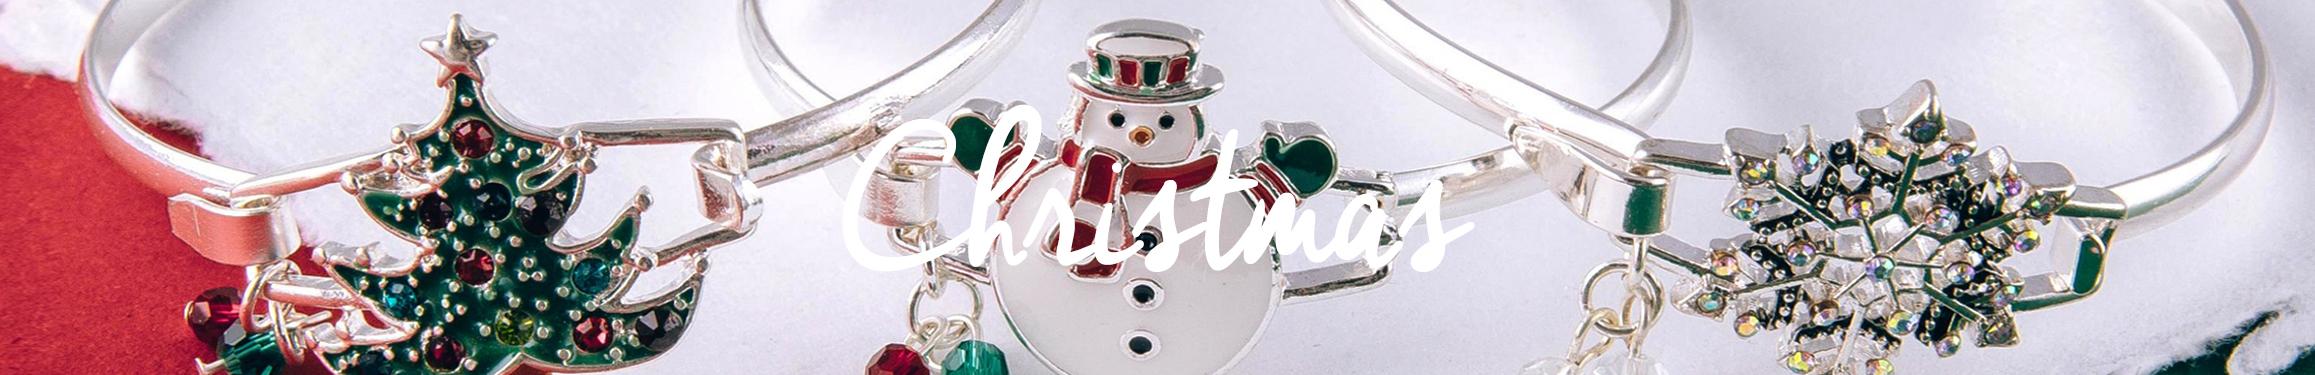 11-19 Christmas REV